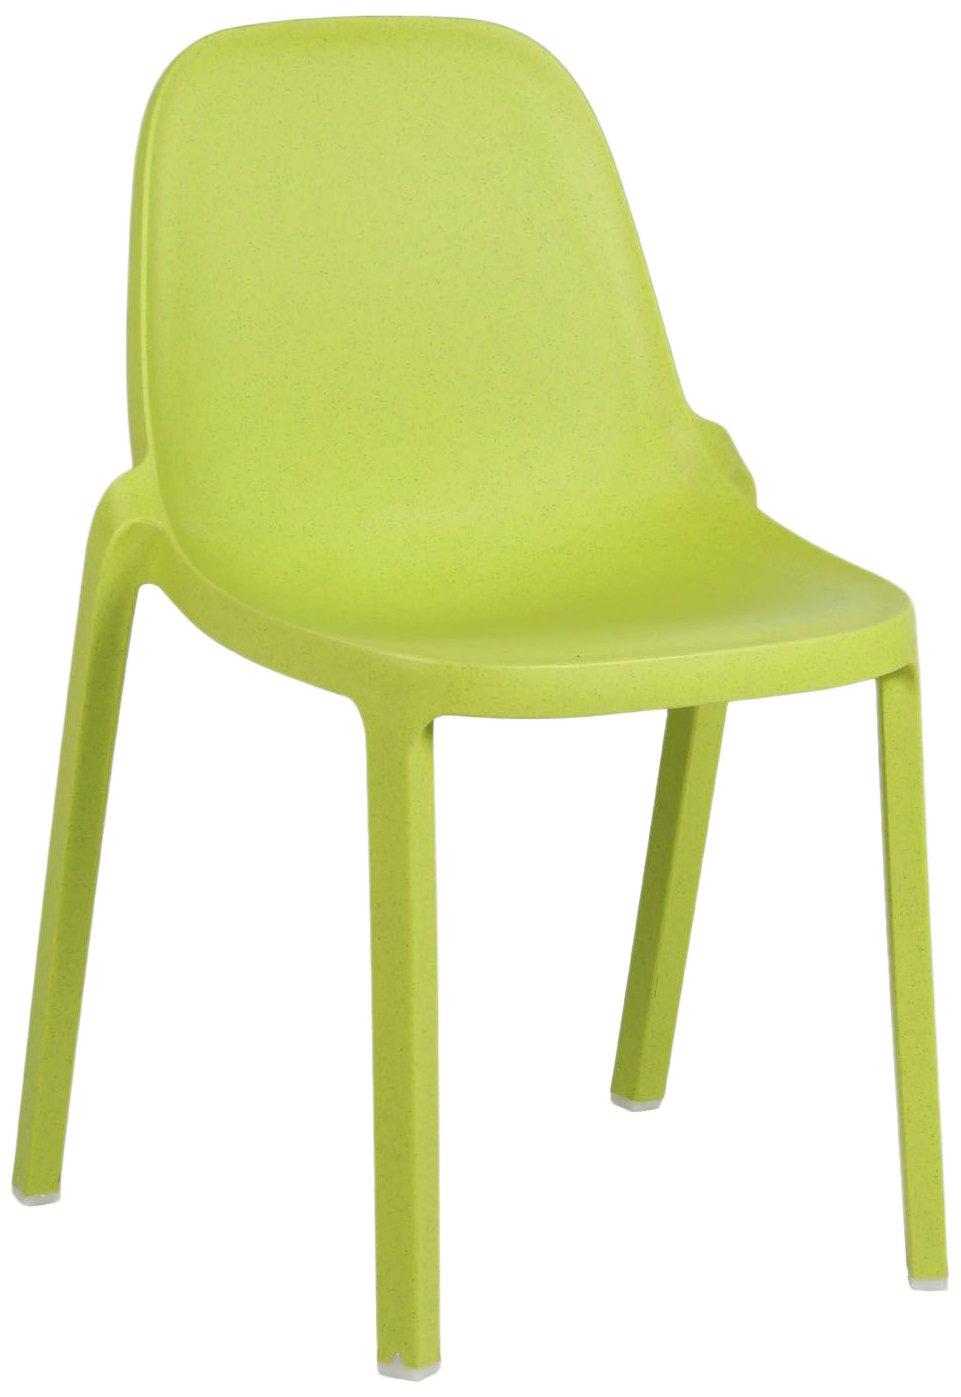 SuperStudio lo+demoda Jouyu Silla, Verde, 82x62x58 cm, 2 ...